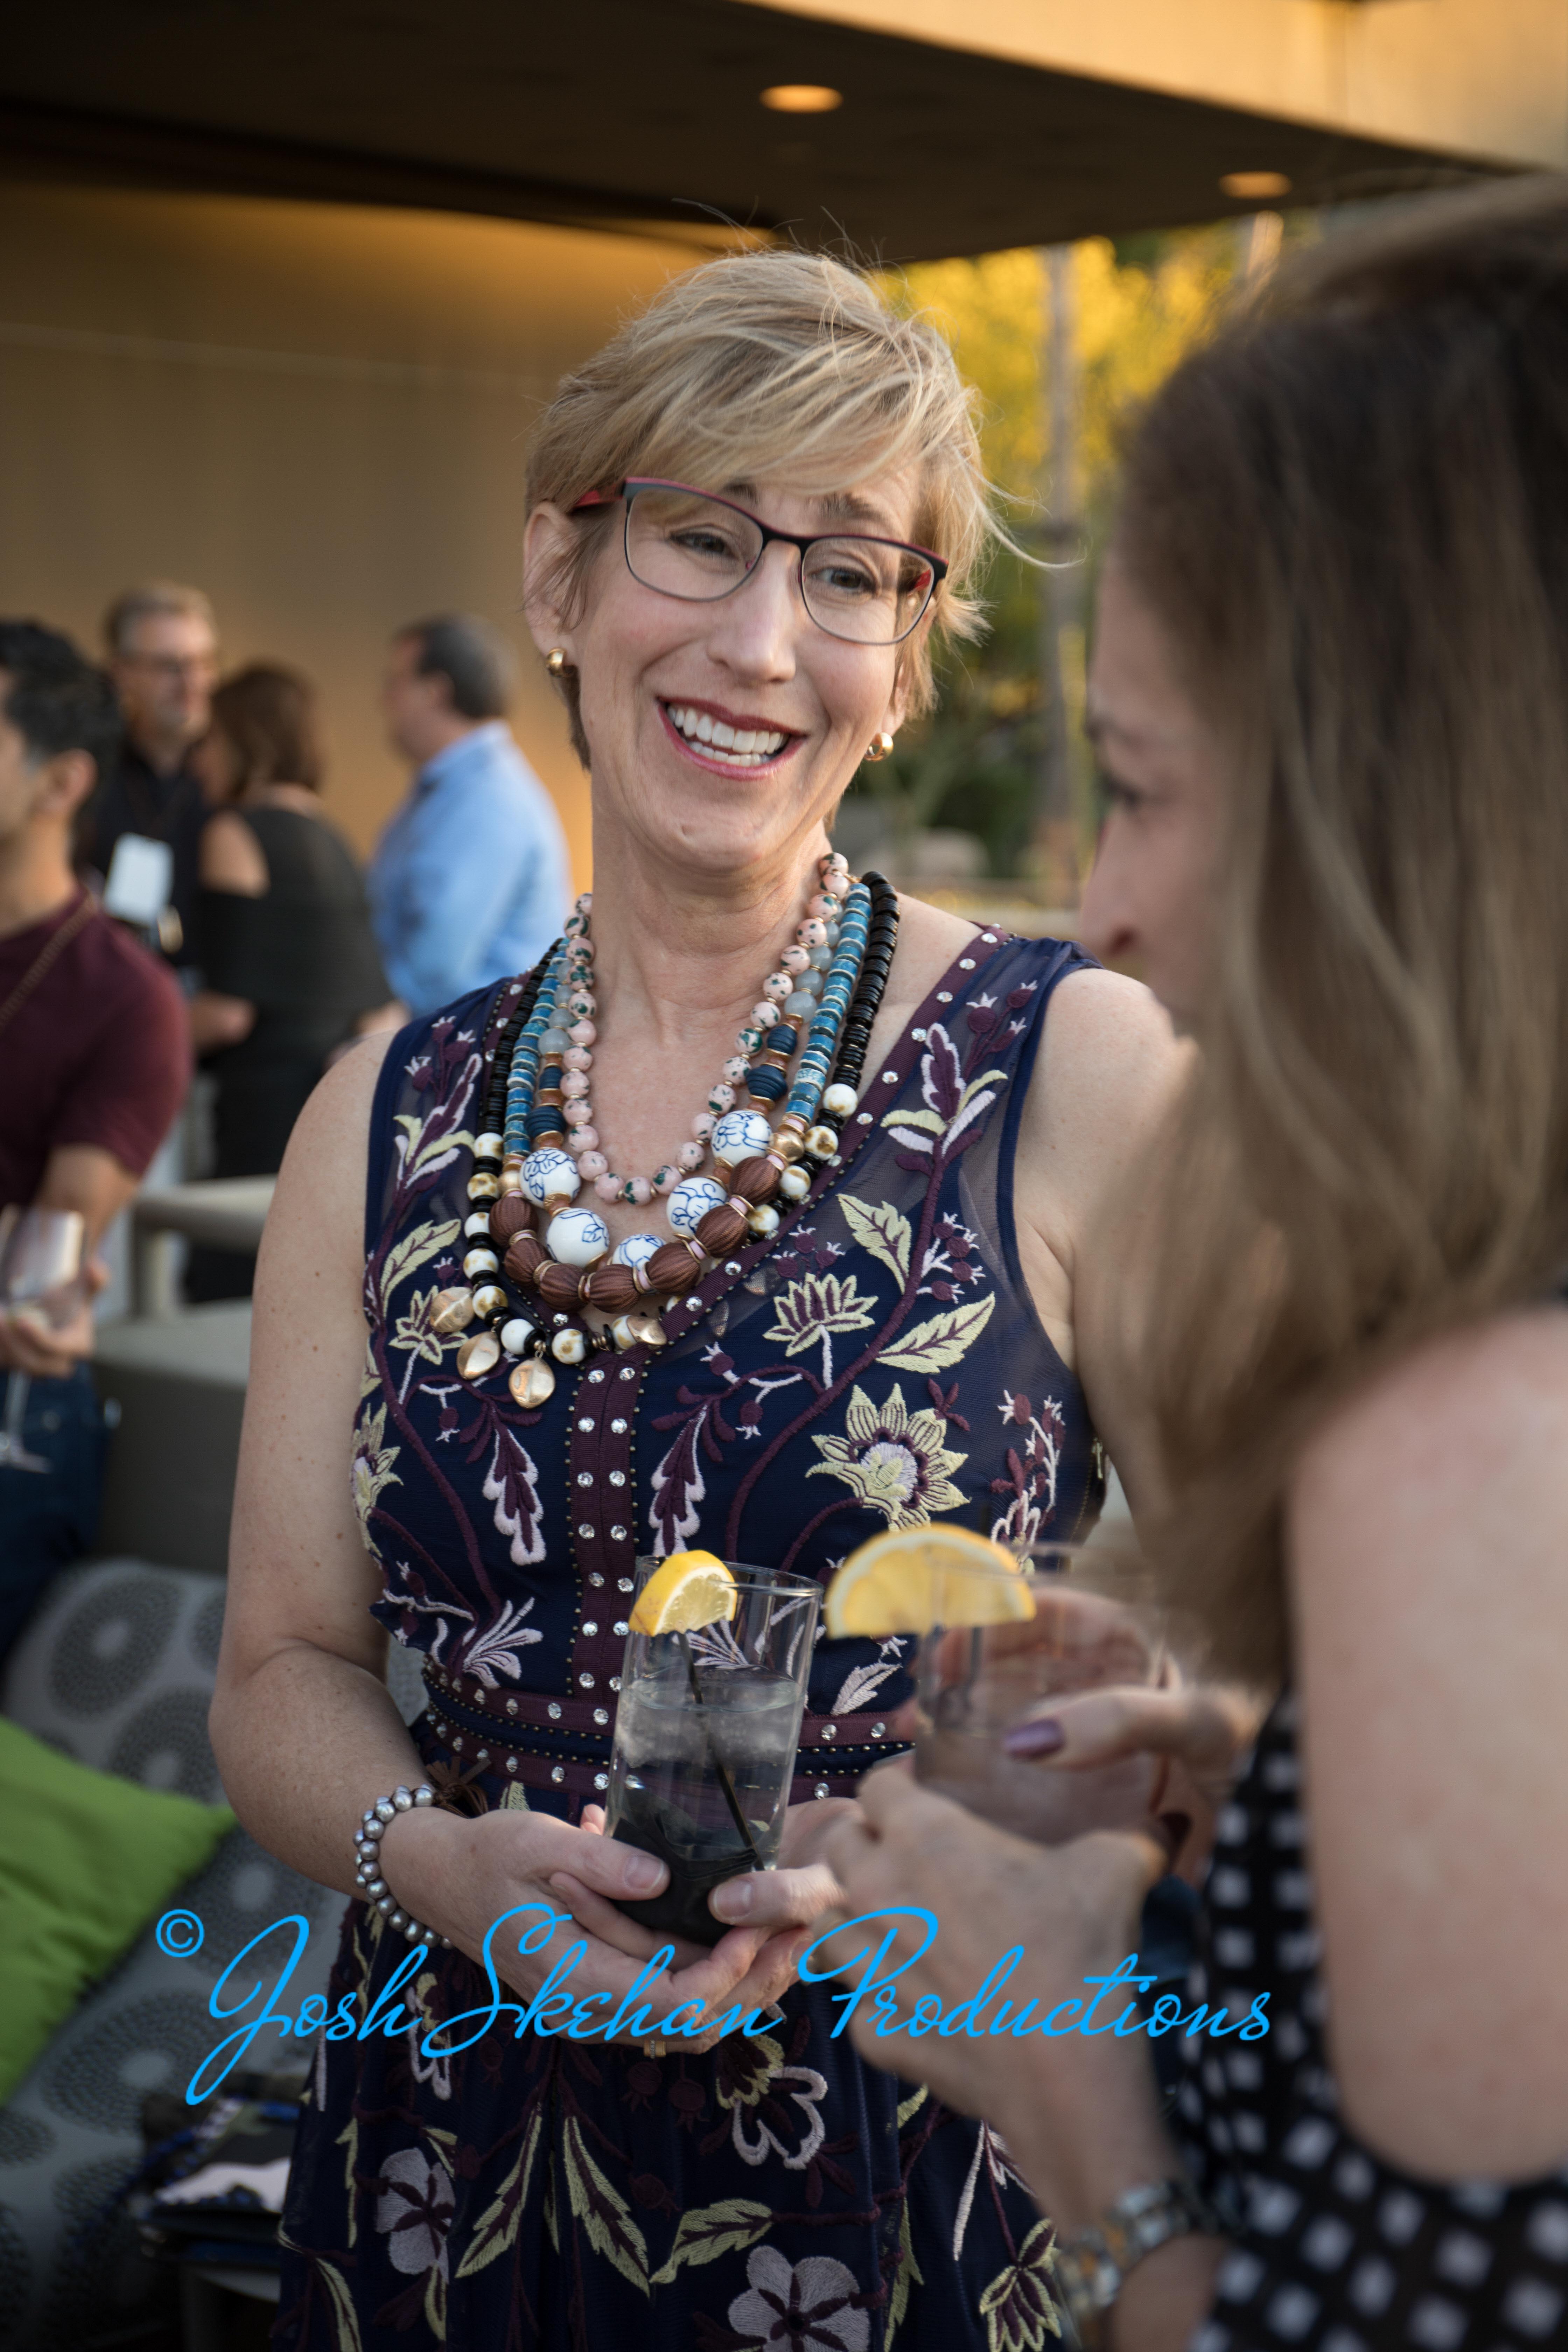 92 event photographer - cocktails - frie